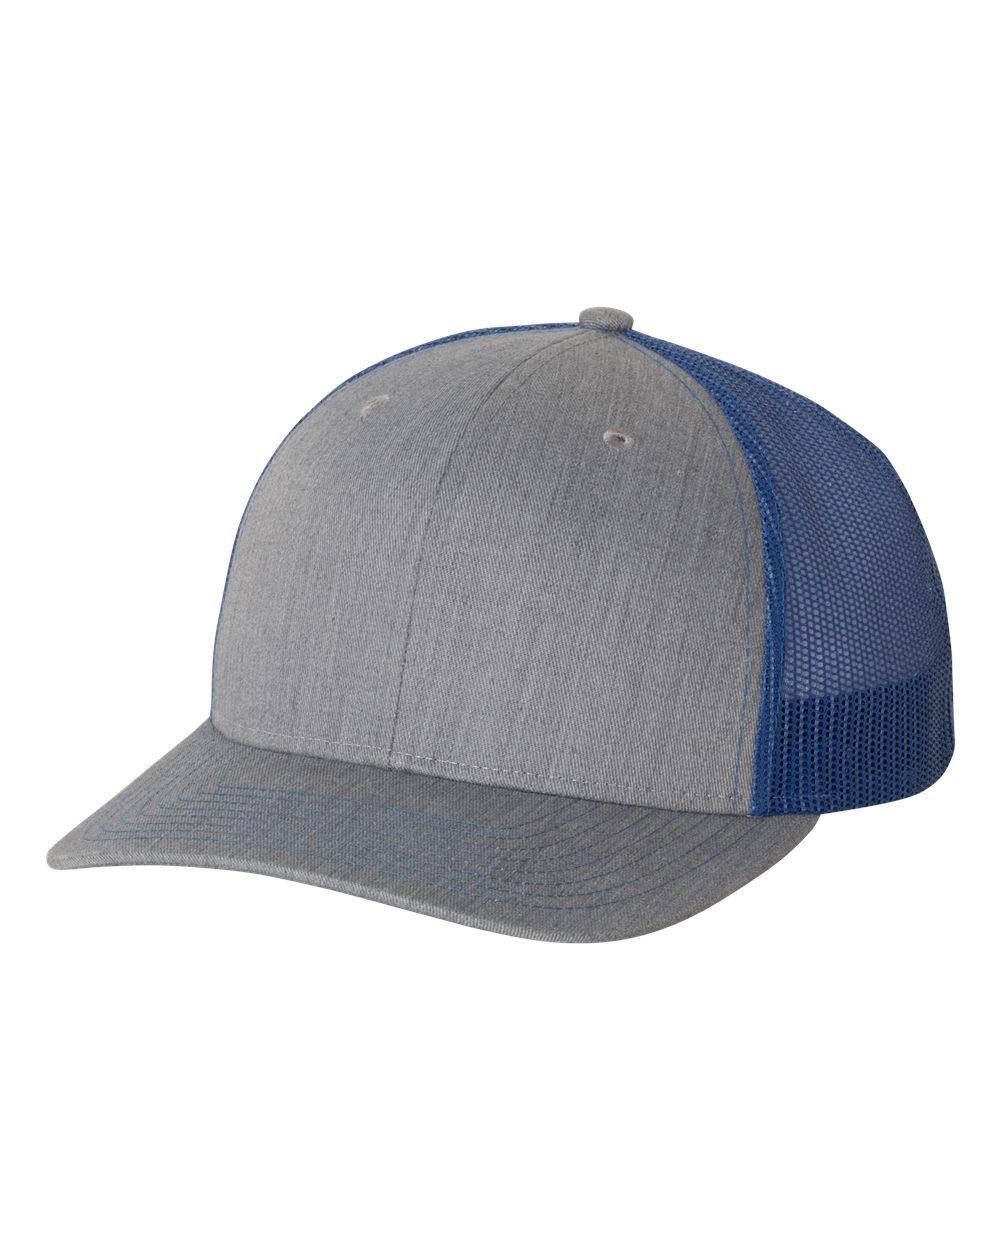 Richardson 112 - Trucker Snapback Cap  4.86 - Headwear 86ac48a6571